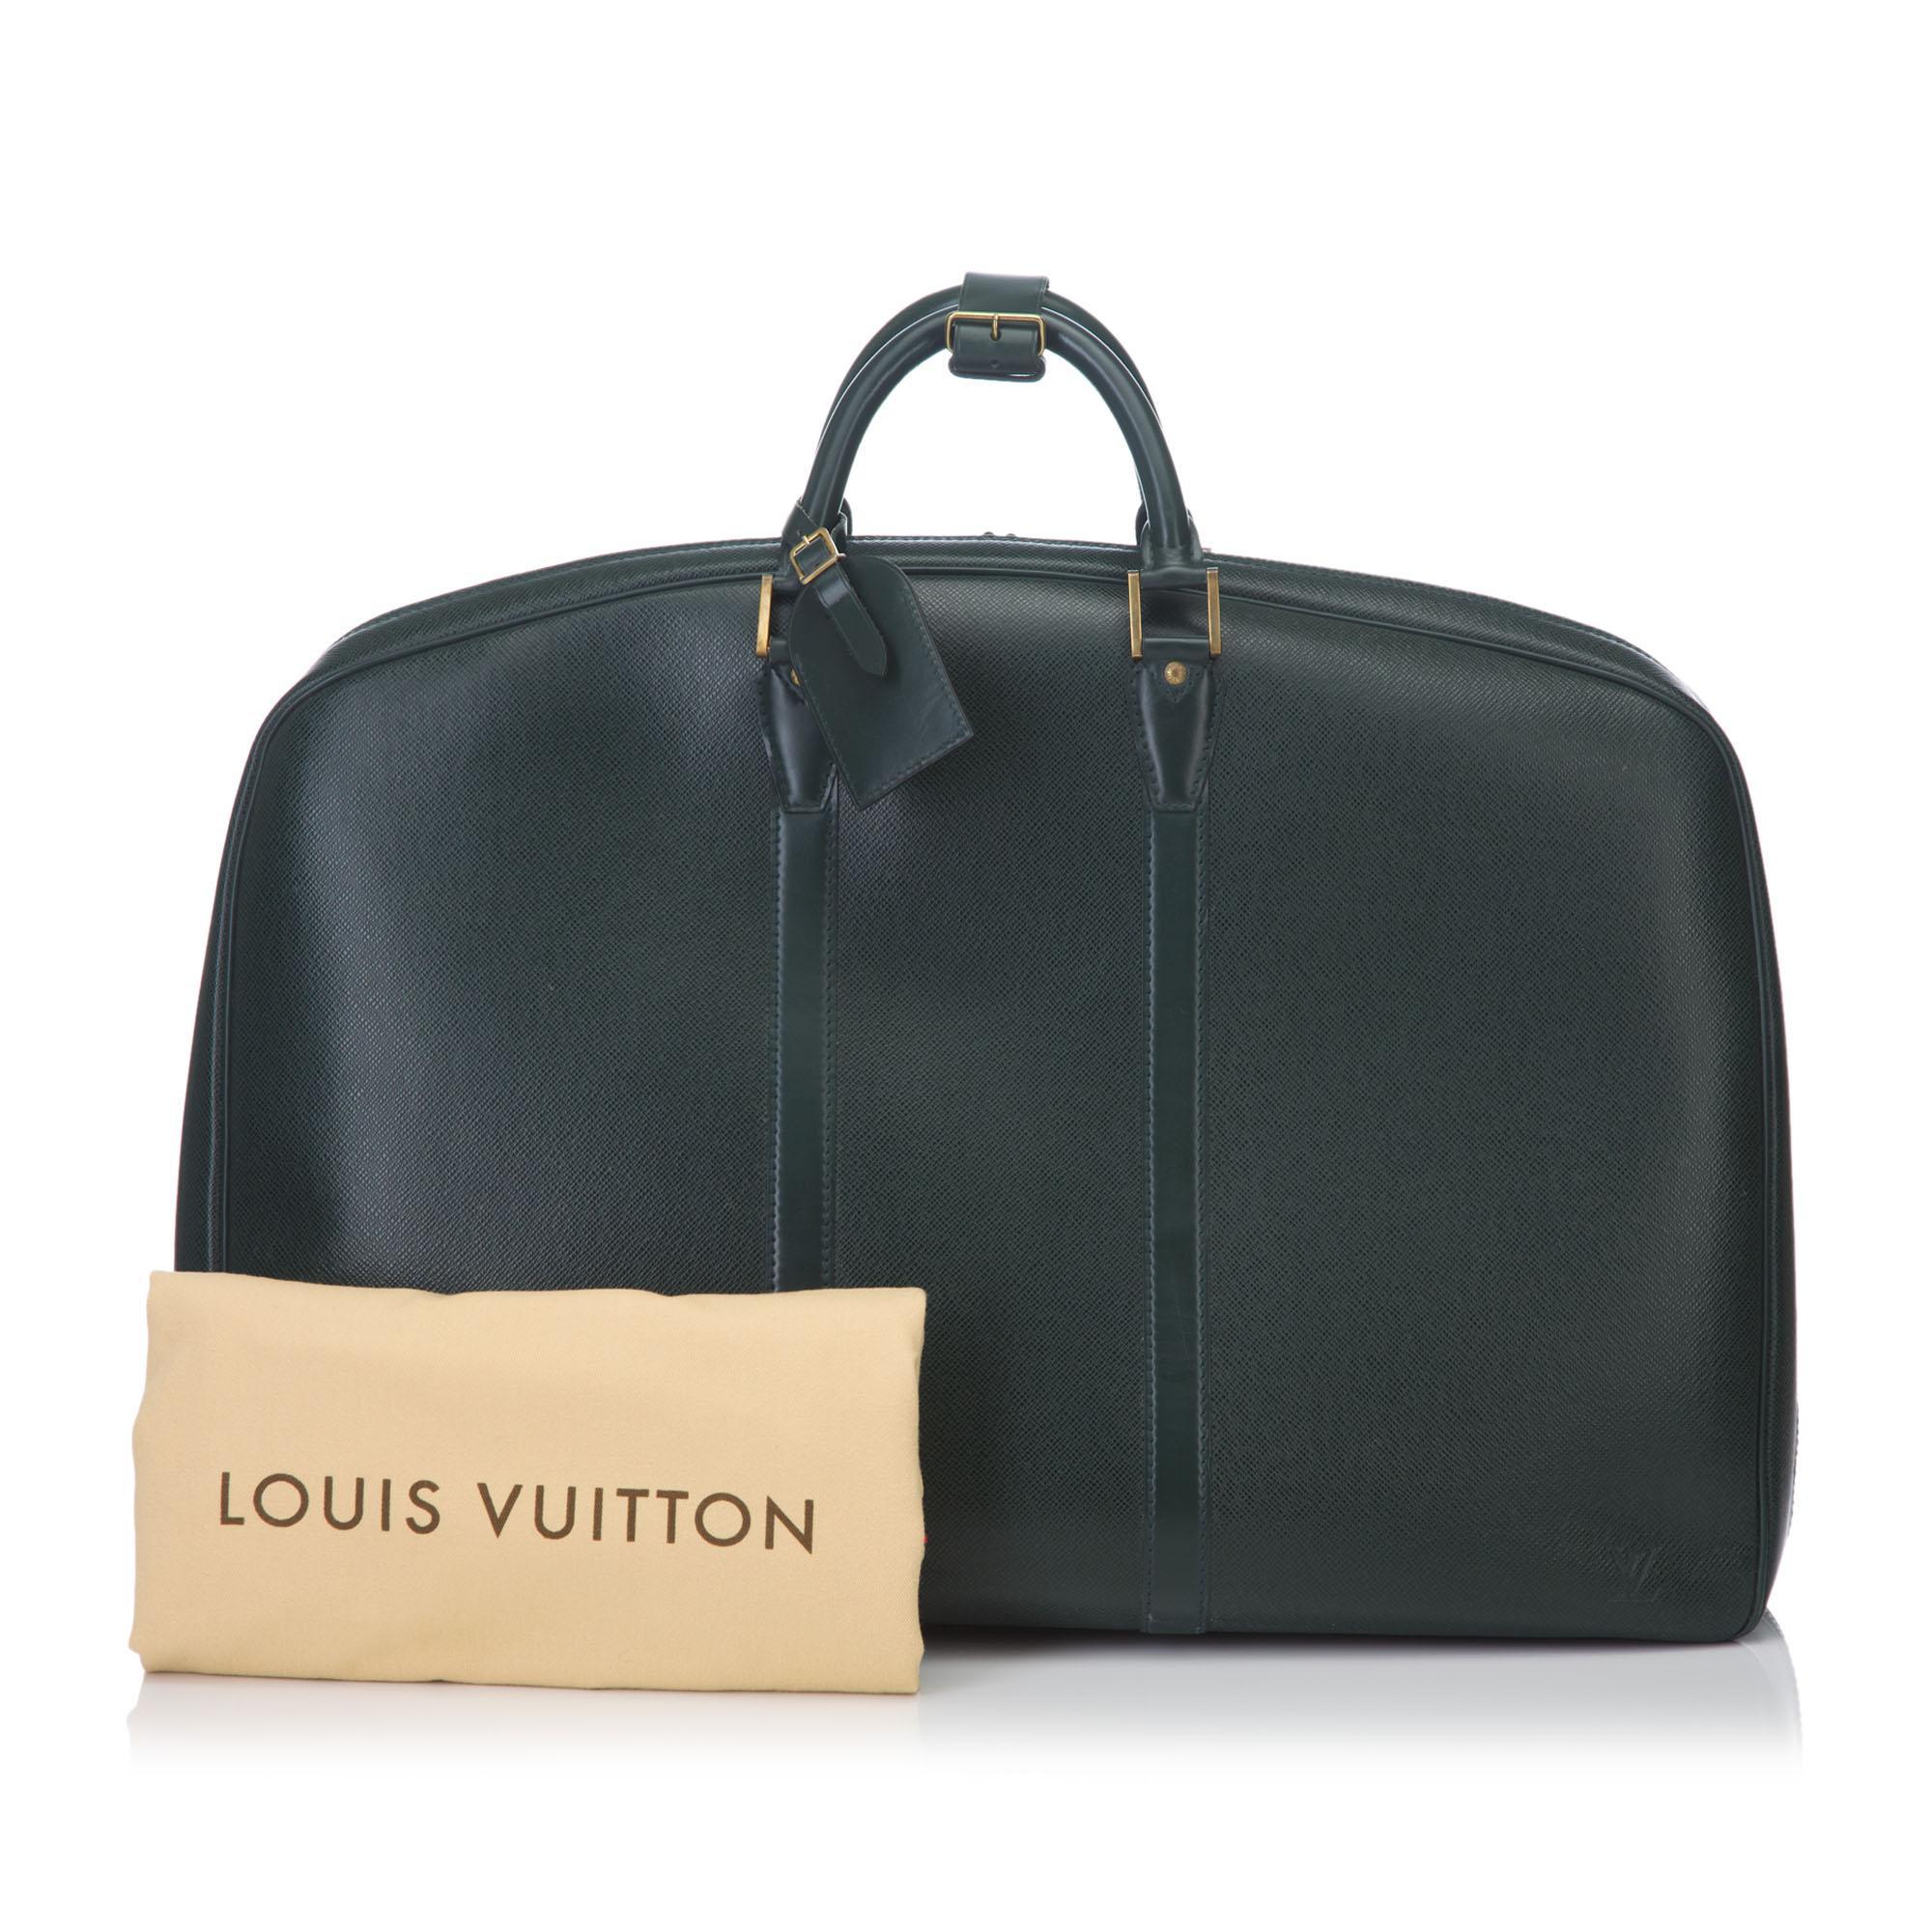 4ef0e0464 Louis Vuitton Epicea Taiga Leather Kendall Gm Bag in Black for Men ...